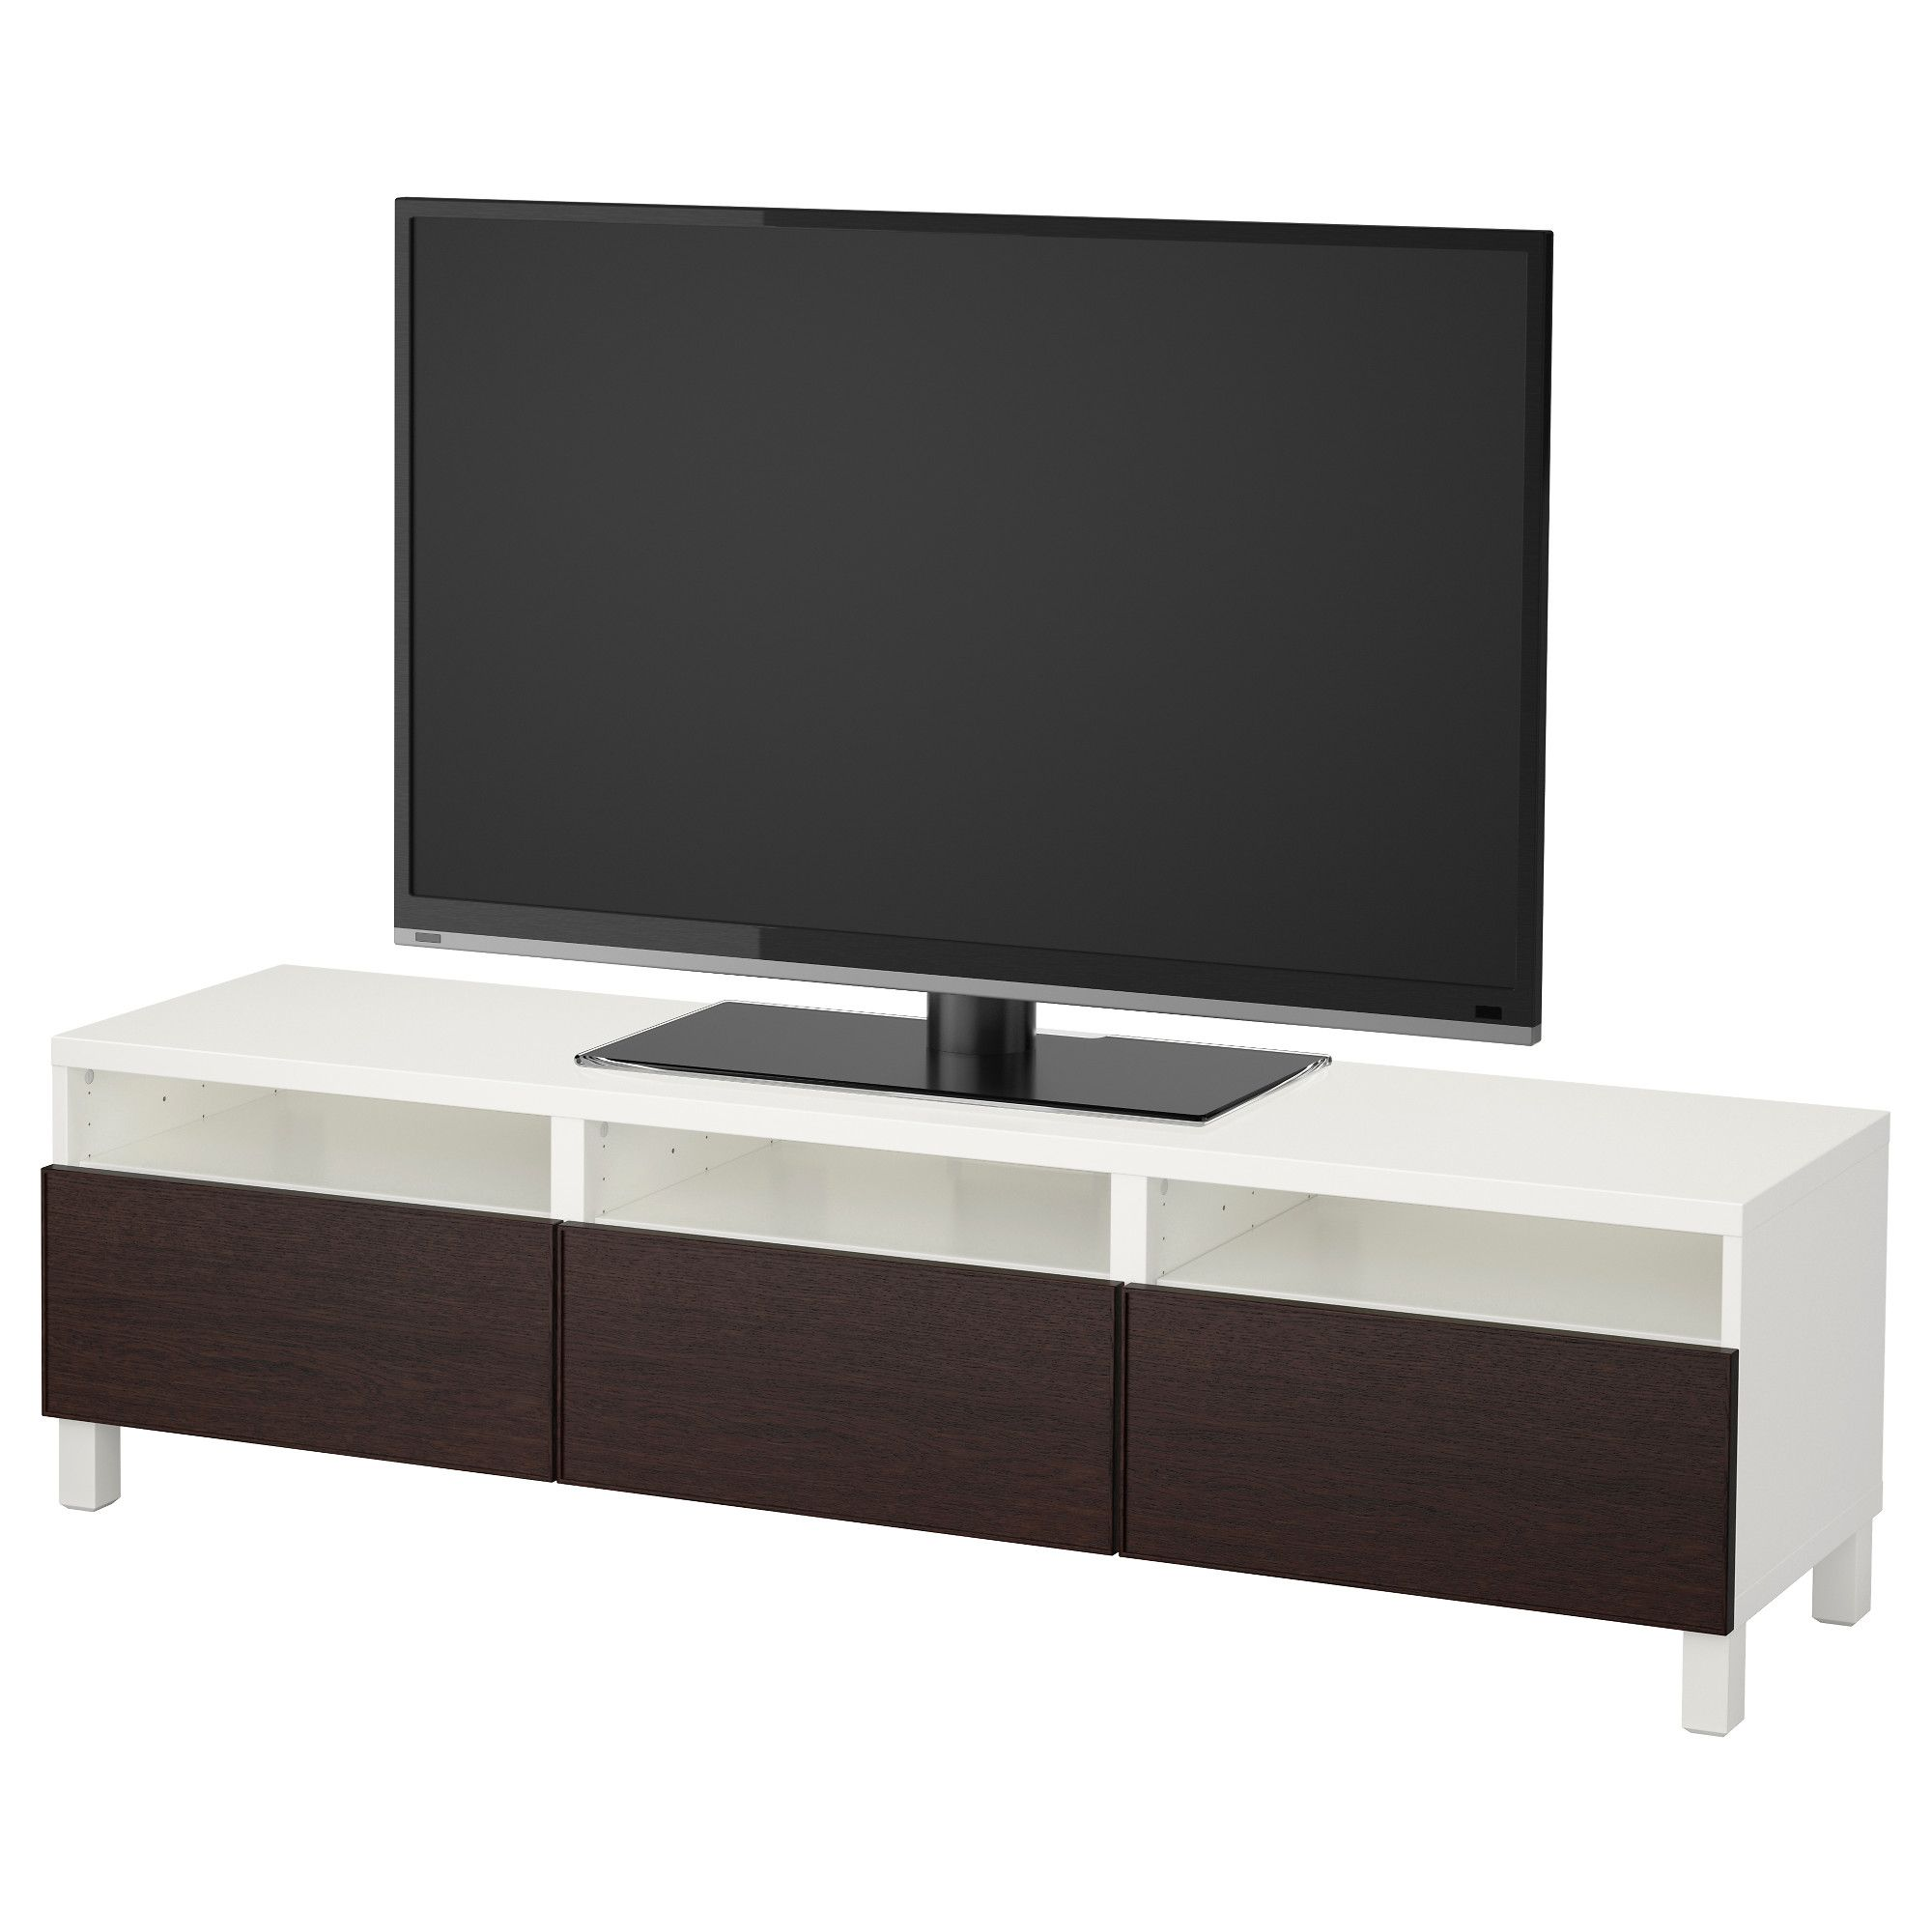 Furniture and Home Furnishings Tv bench, Ikea tv, Ikea